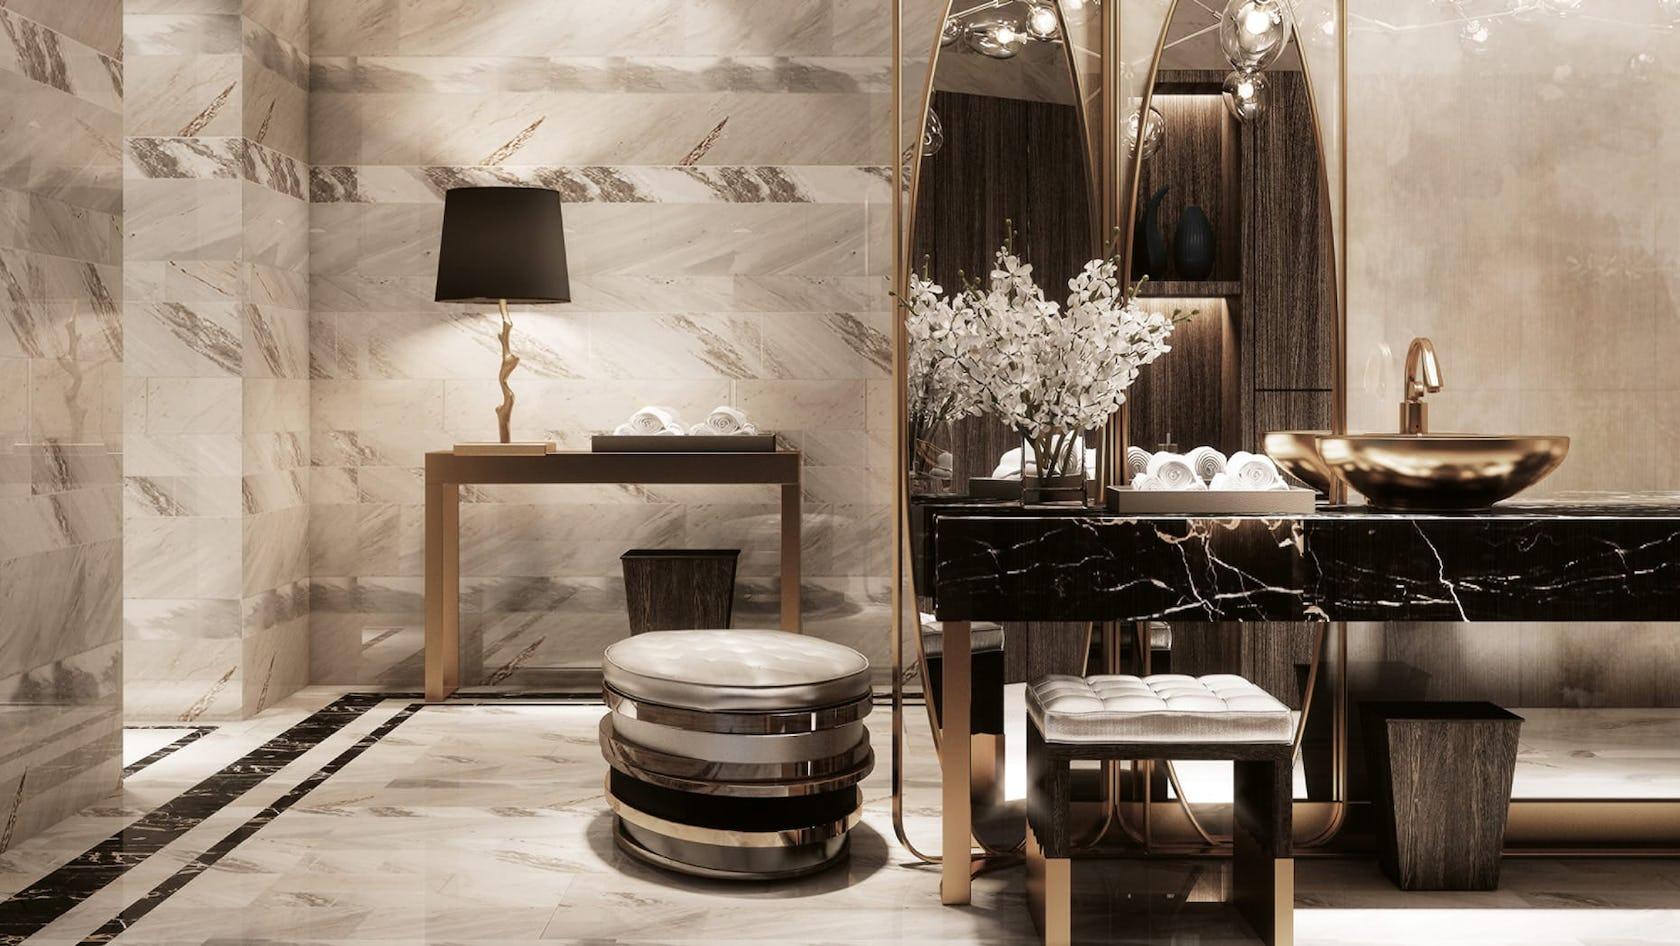 furniture interior design indoors room lighting table living room